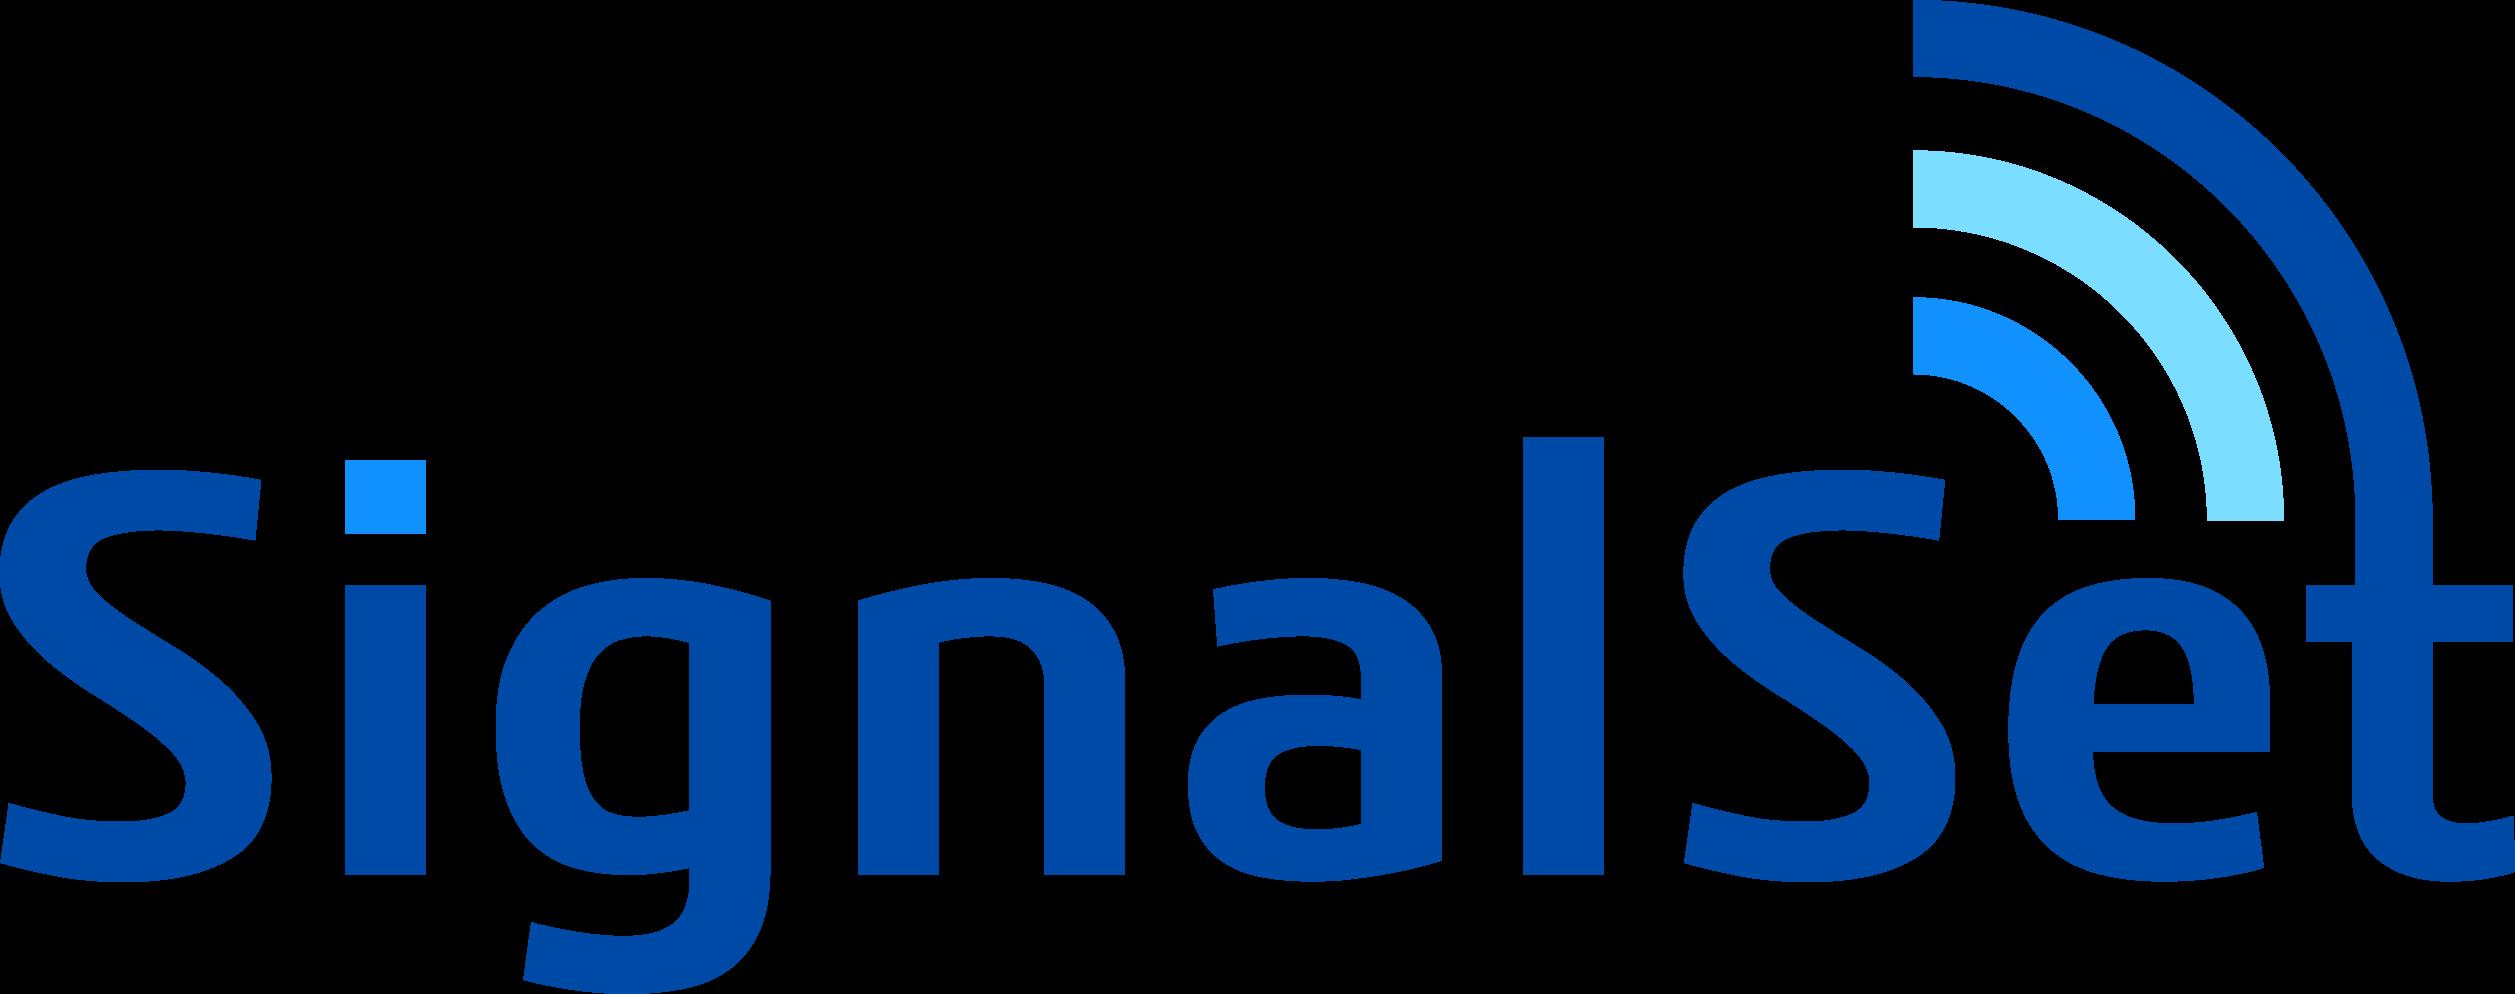 SignalSet Logo